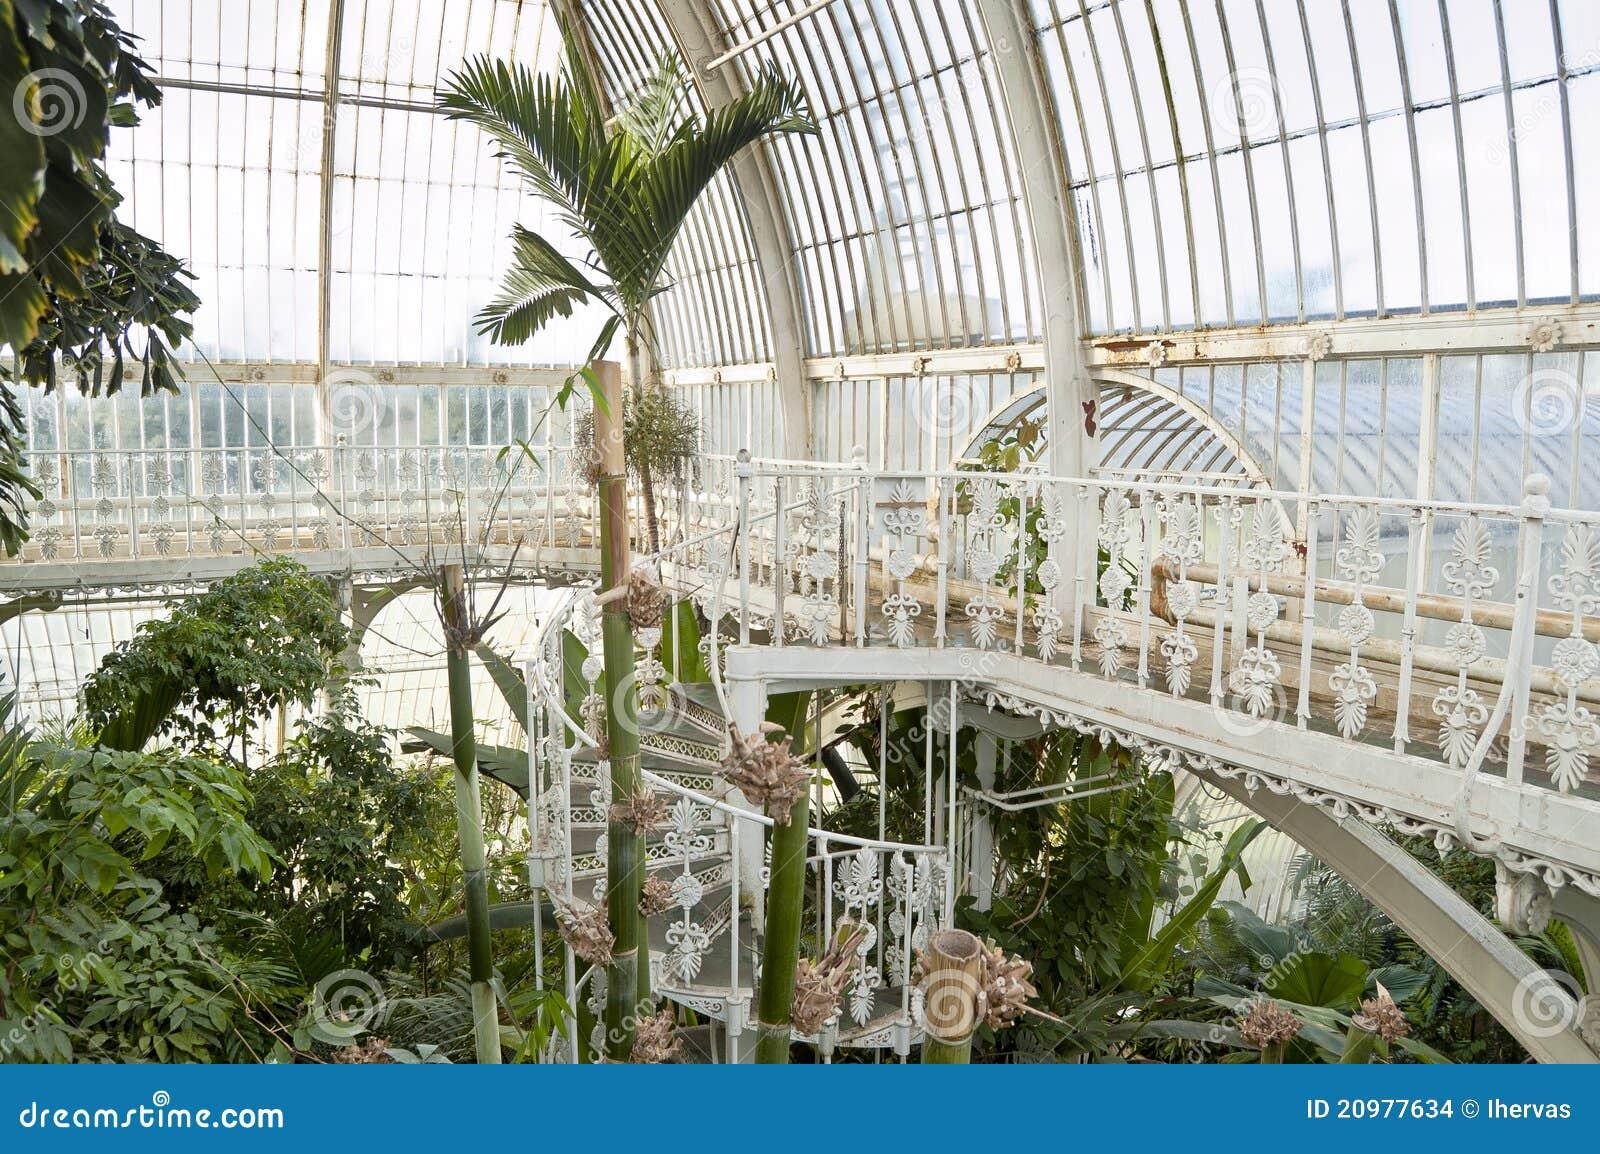 palm-house-kew-gardens-london-20977634 Palm Garden House Plan on conservatory plans, tree plans, greenhouse plans, cathedral plans, pagoda plans, park plans, garden plans, pond plans, pavilion plans, wardian case plans,